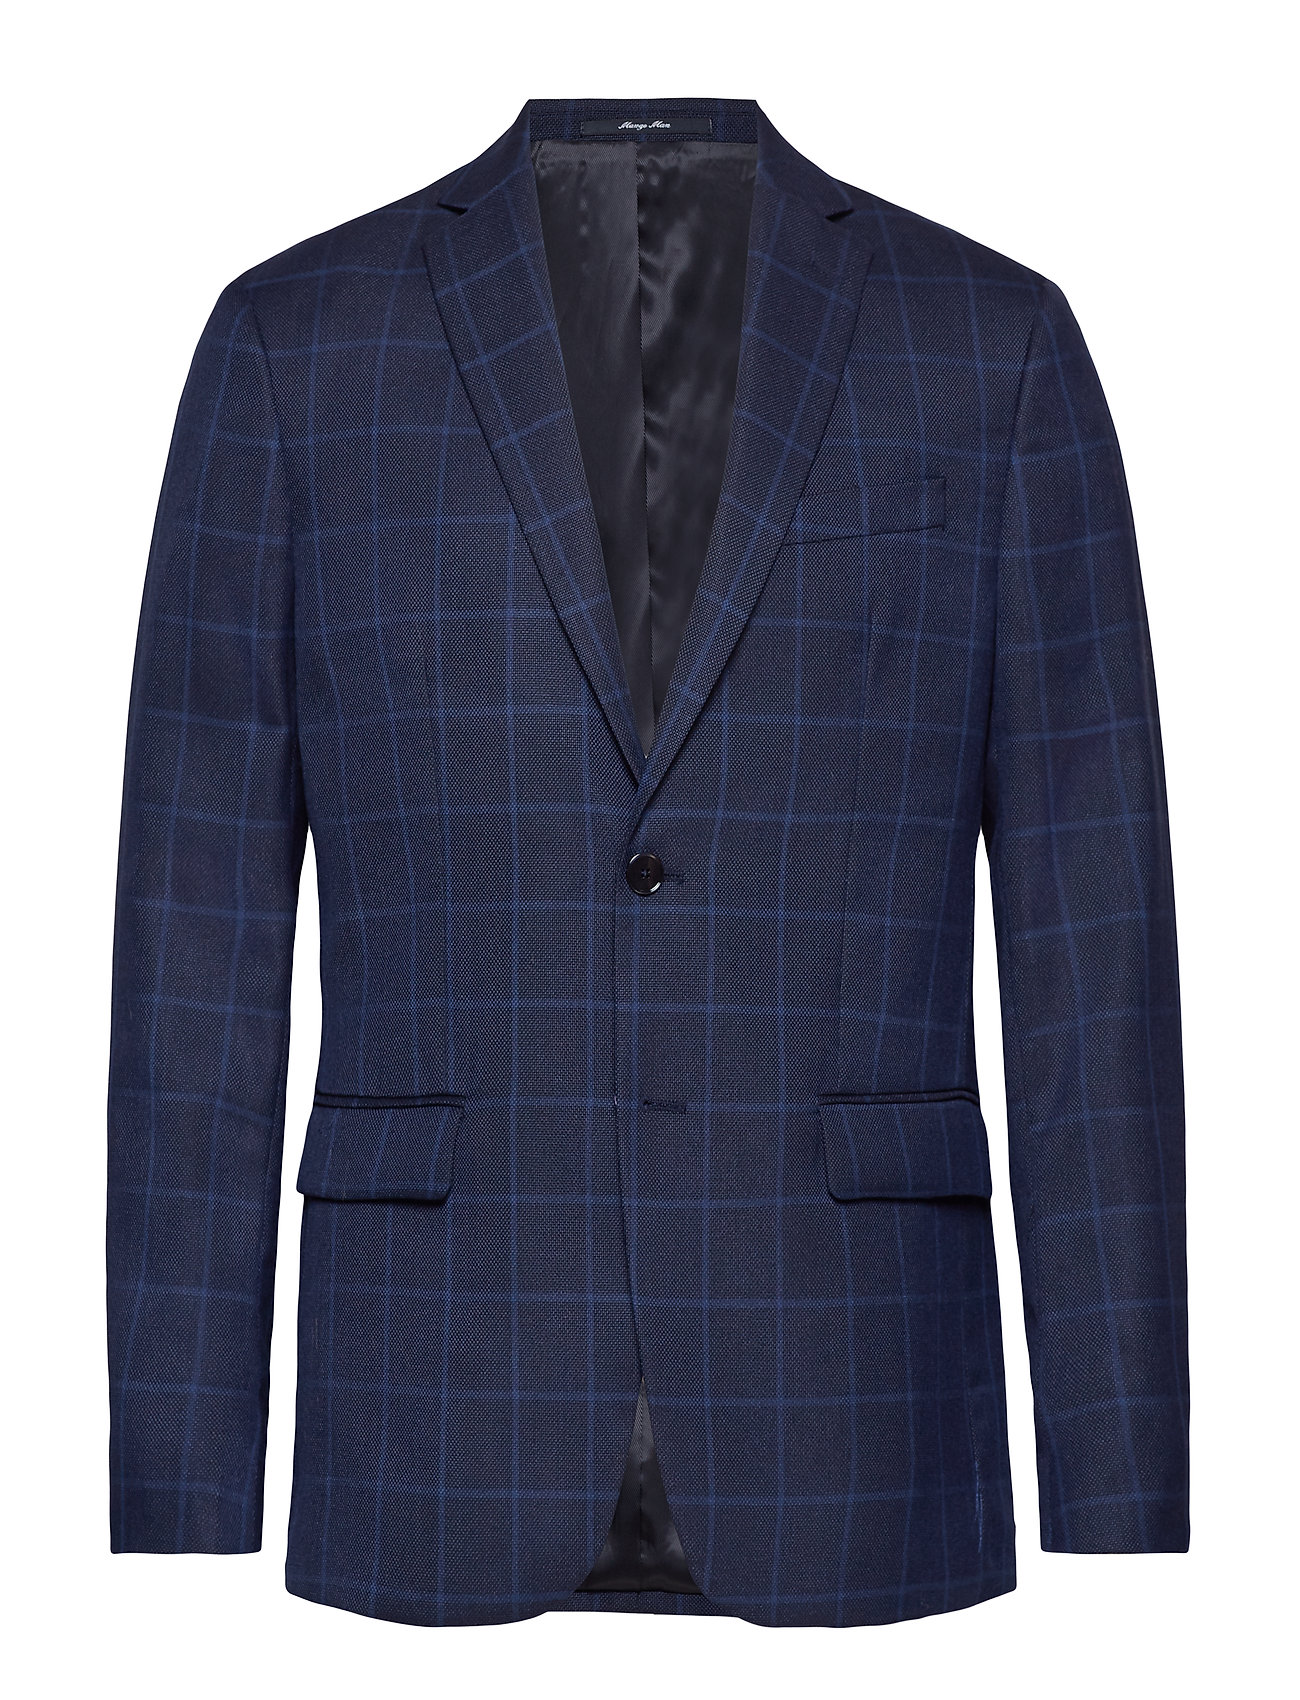 Mango Man Slim fit check suit blazer Kostymer & kavajer